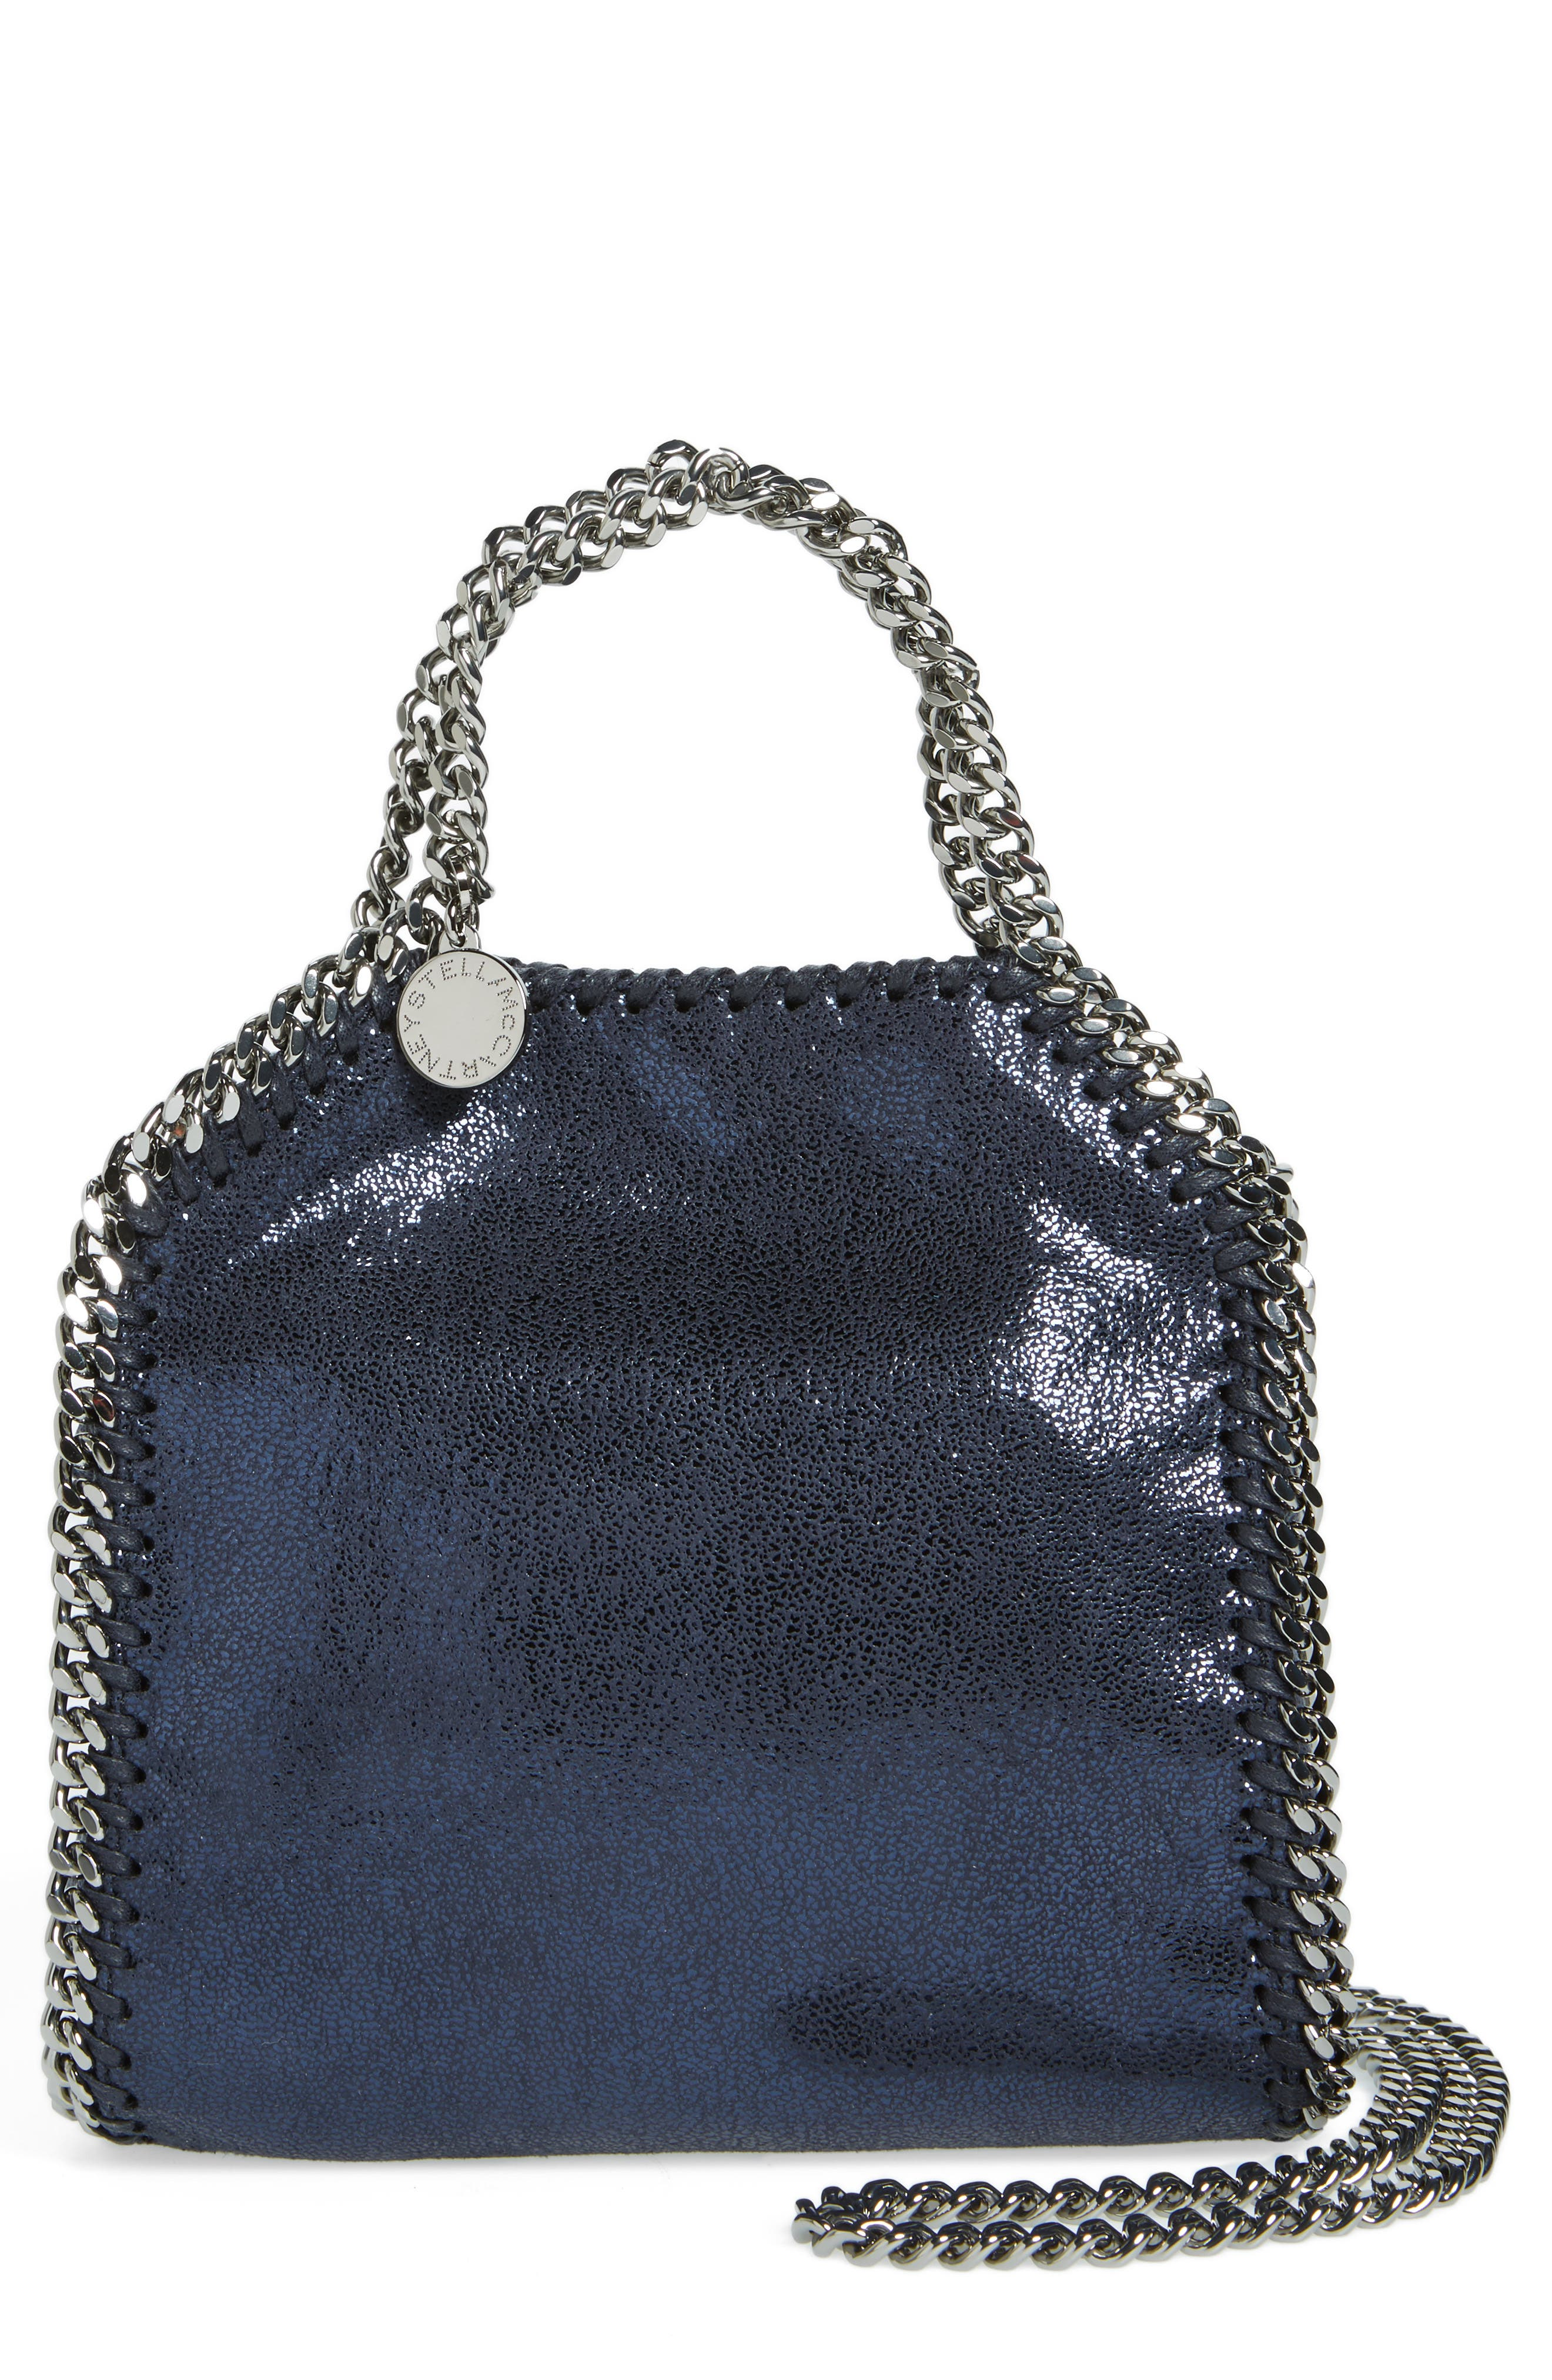 'Tiny Falabella' Metallic Faux Leather Crossbody Bag,                             Main thumbnail 1, color,                             Ink